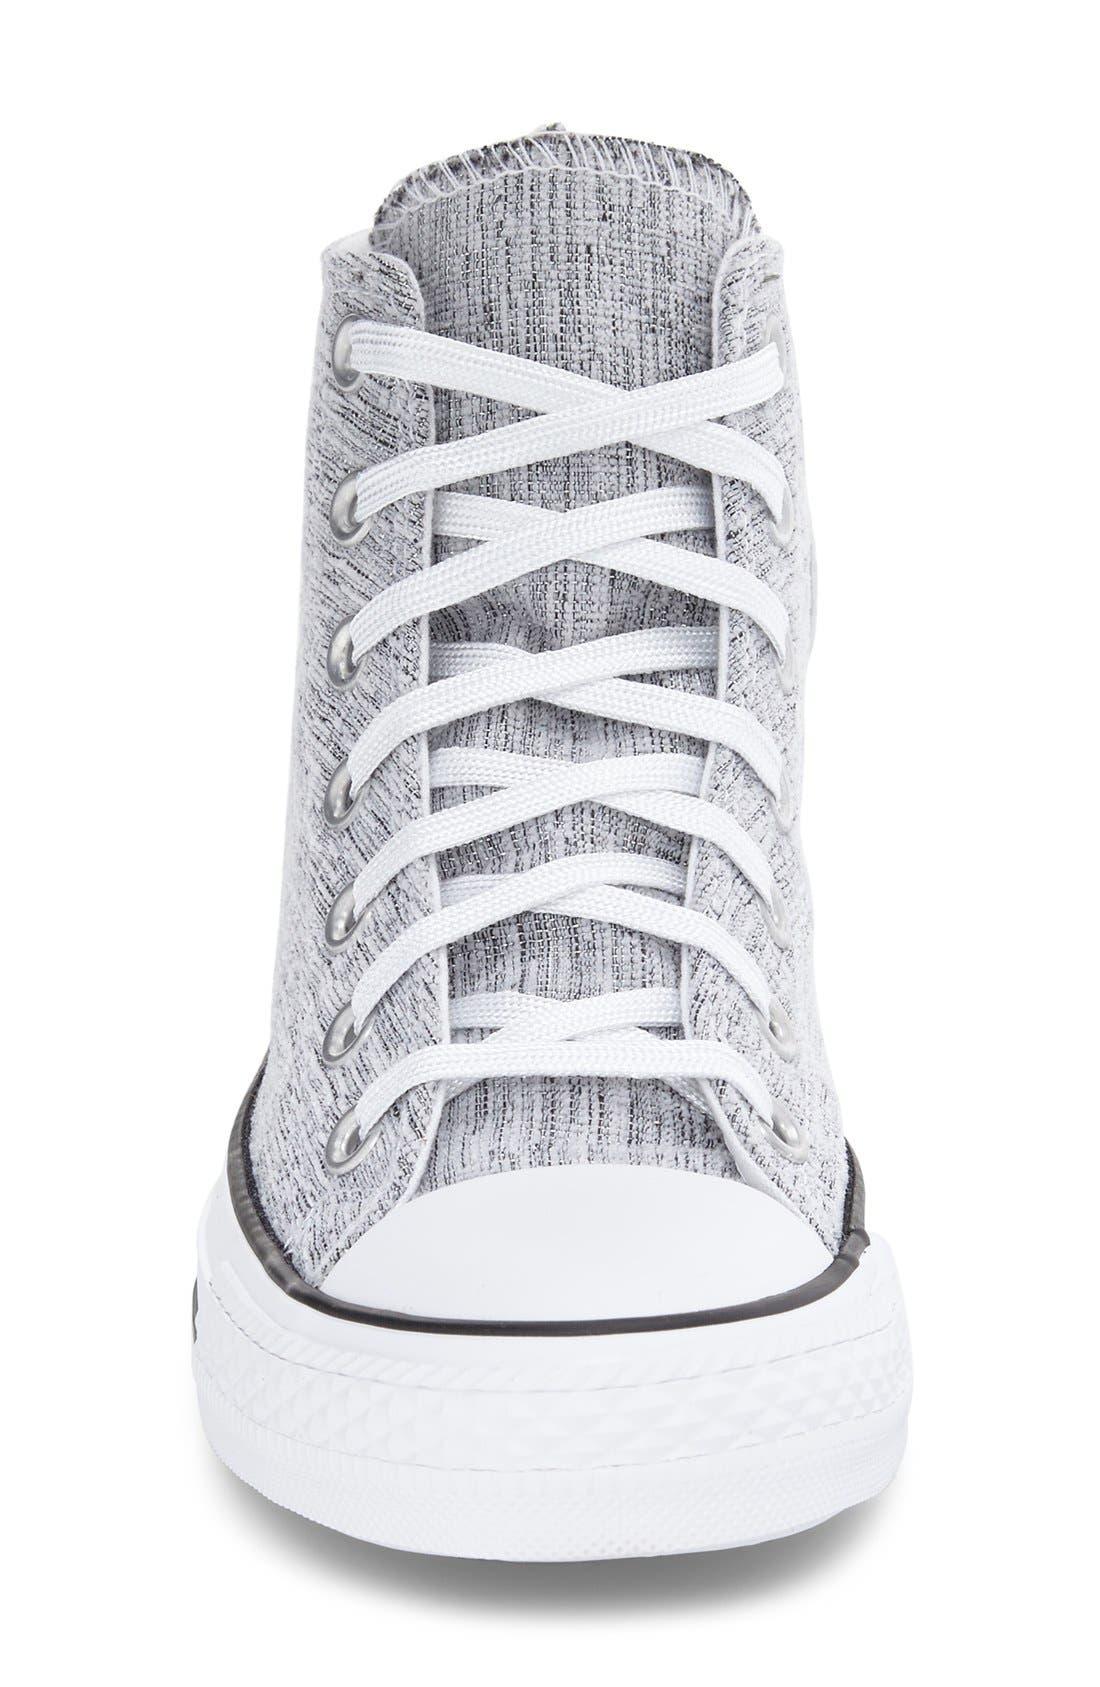 Alternate Image 3  - Converse Chuck Taylor® All Star® Knit High Top Sneaker (Women)